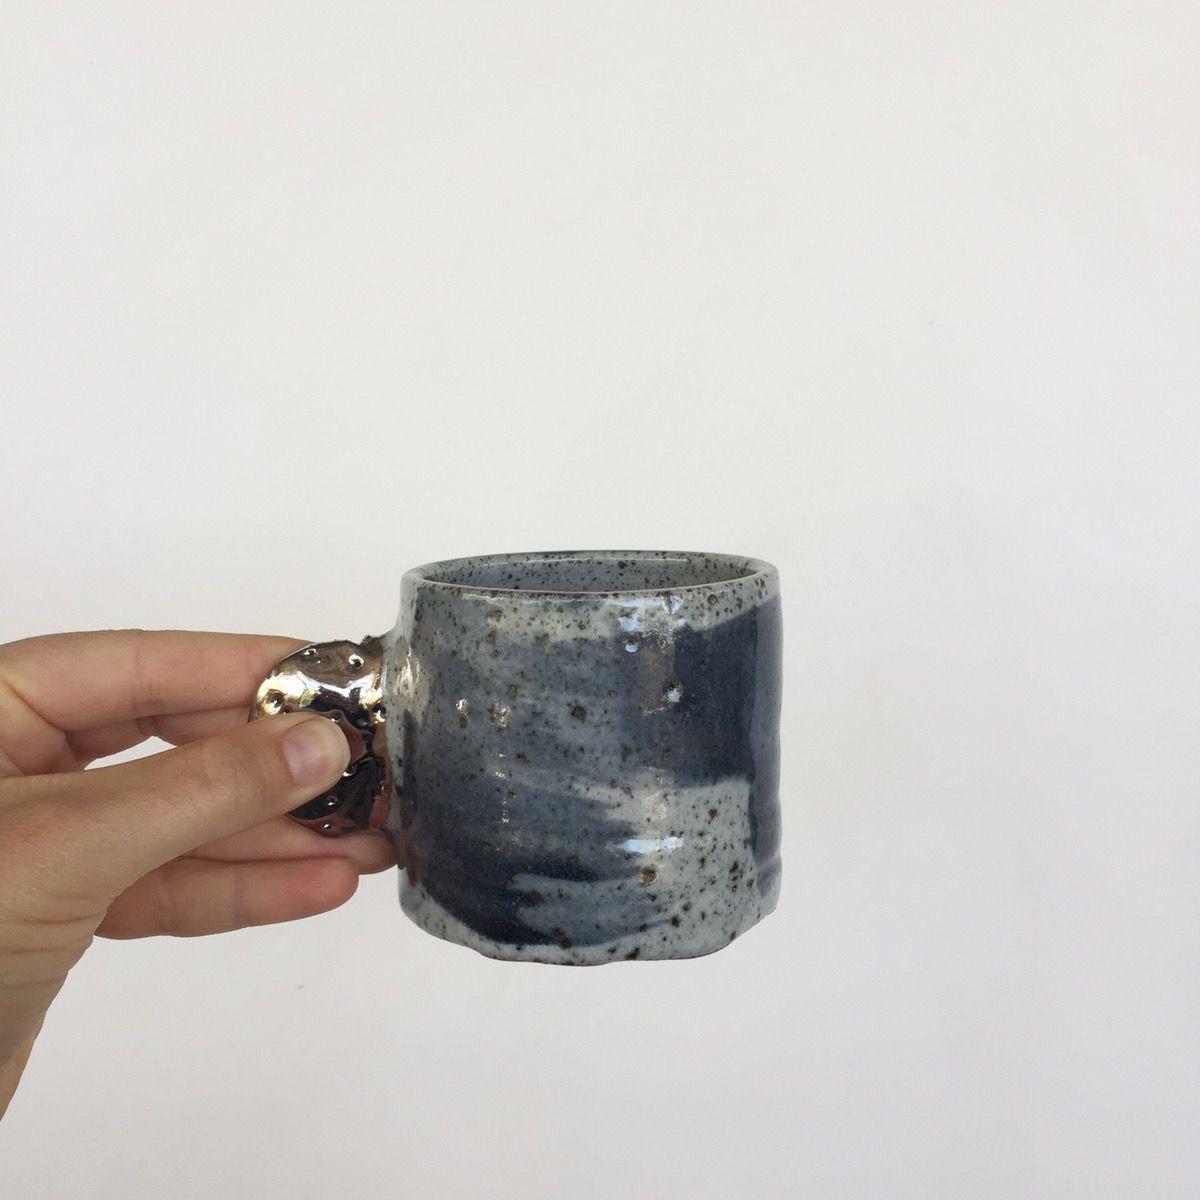 HANDMADE Stoneware 8 X 8 cm Food safe HAND WASH